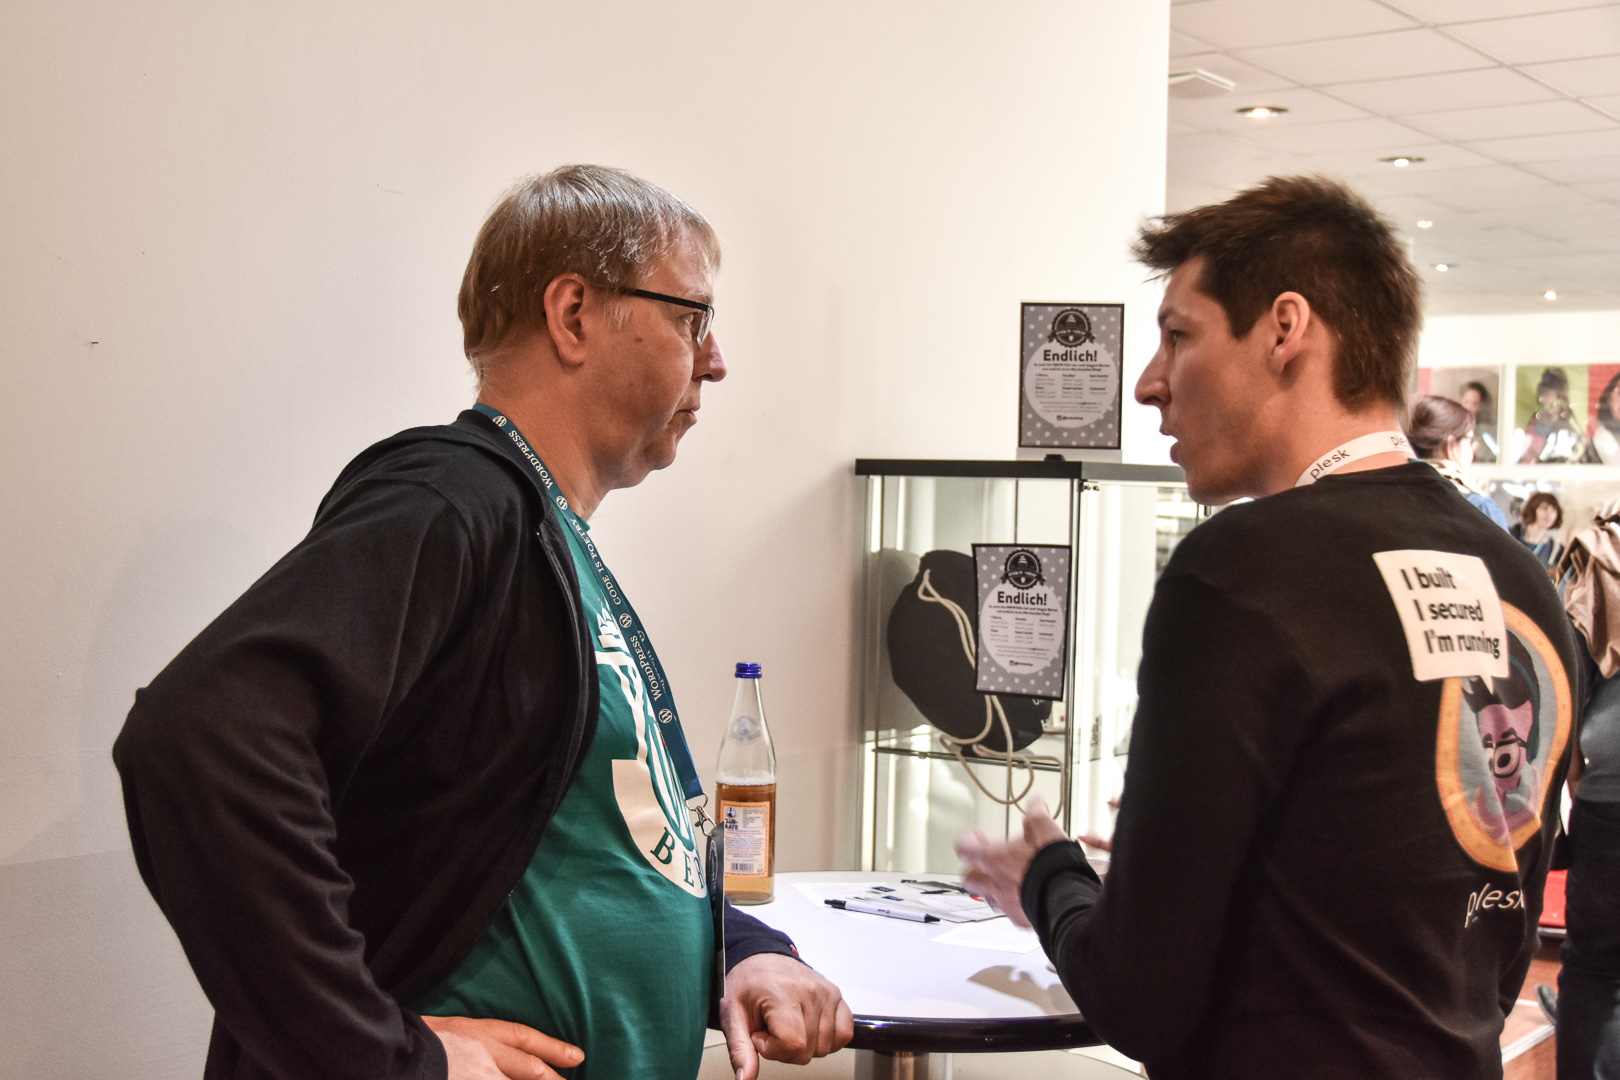 WordCamp Cologne, Gerd Zimmermann and Plesk's CTO Jan Löffler